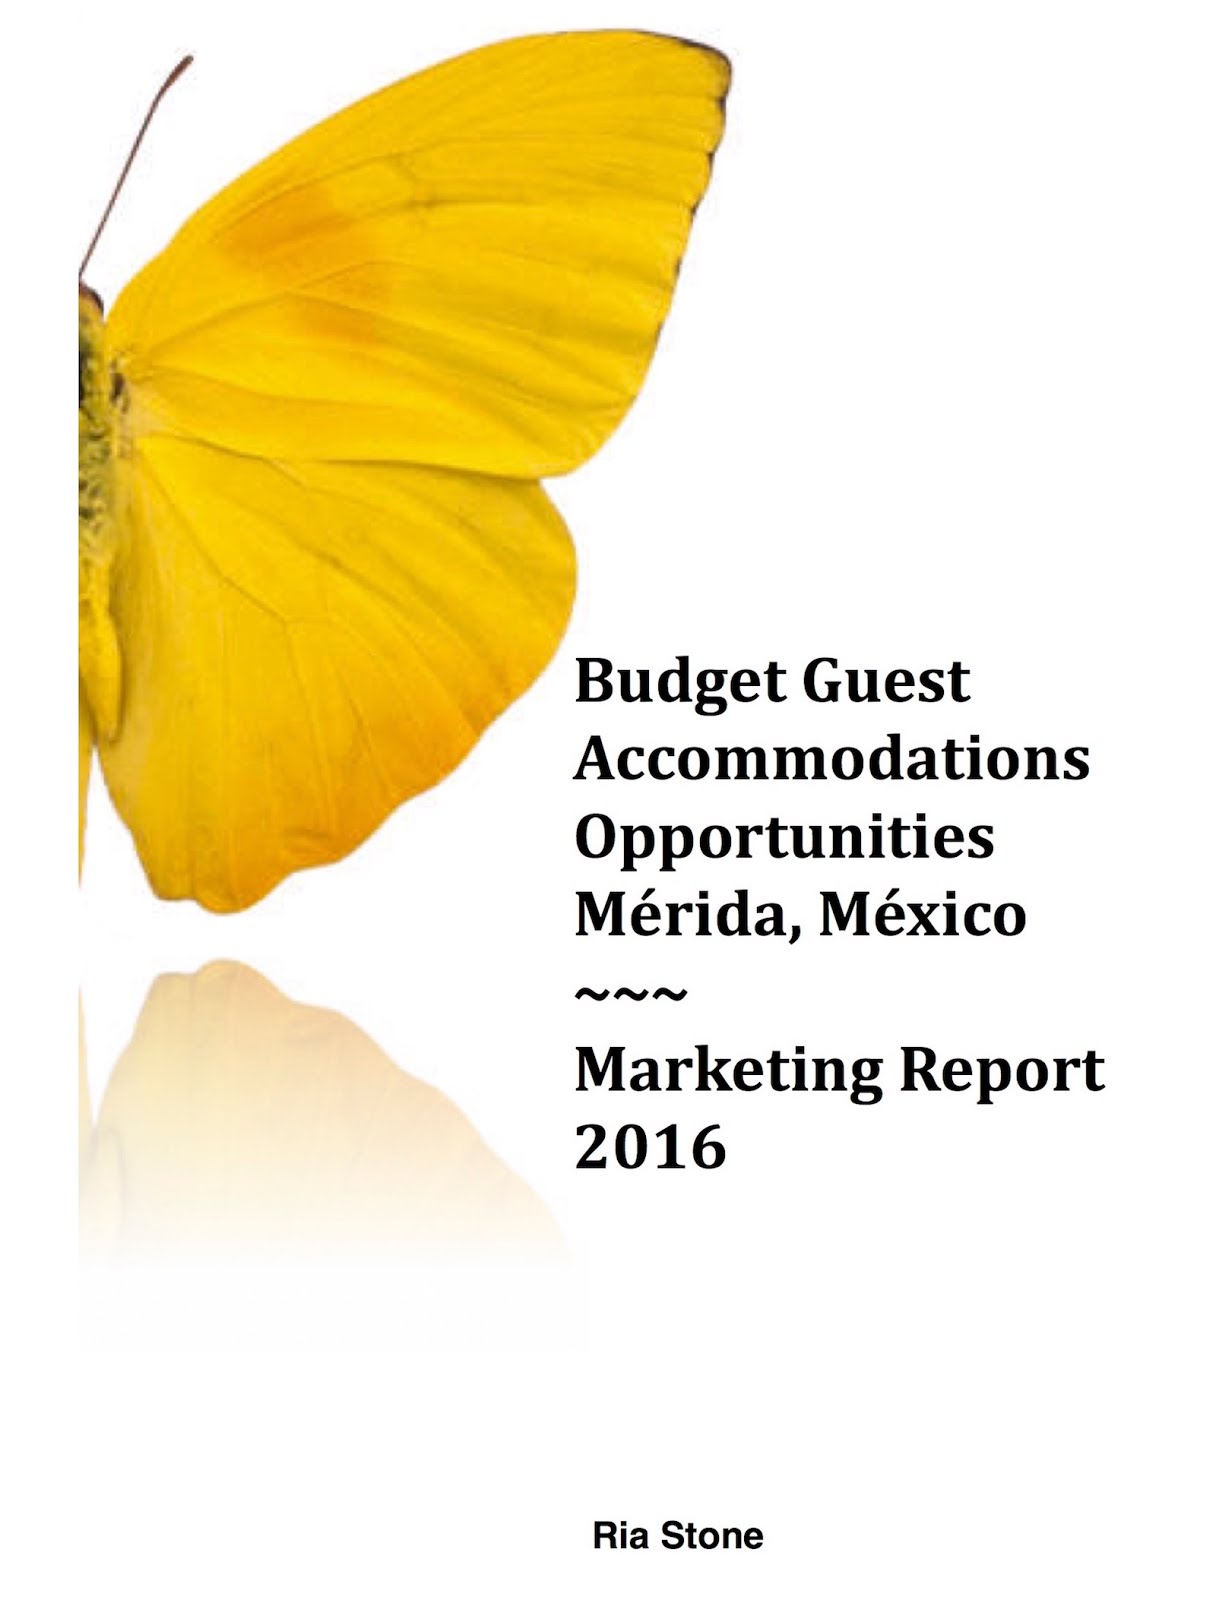 Preorder: Budget Guest Accommodations Opportunities Marketing Report, Mérida, México